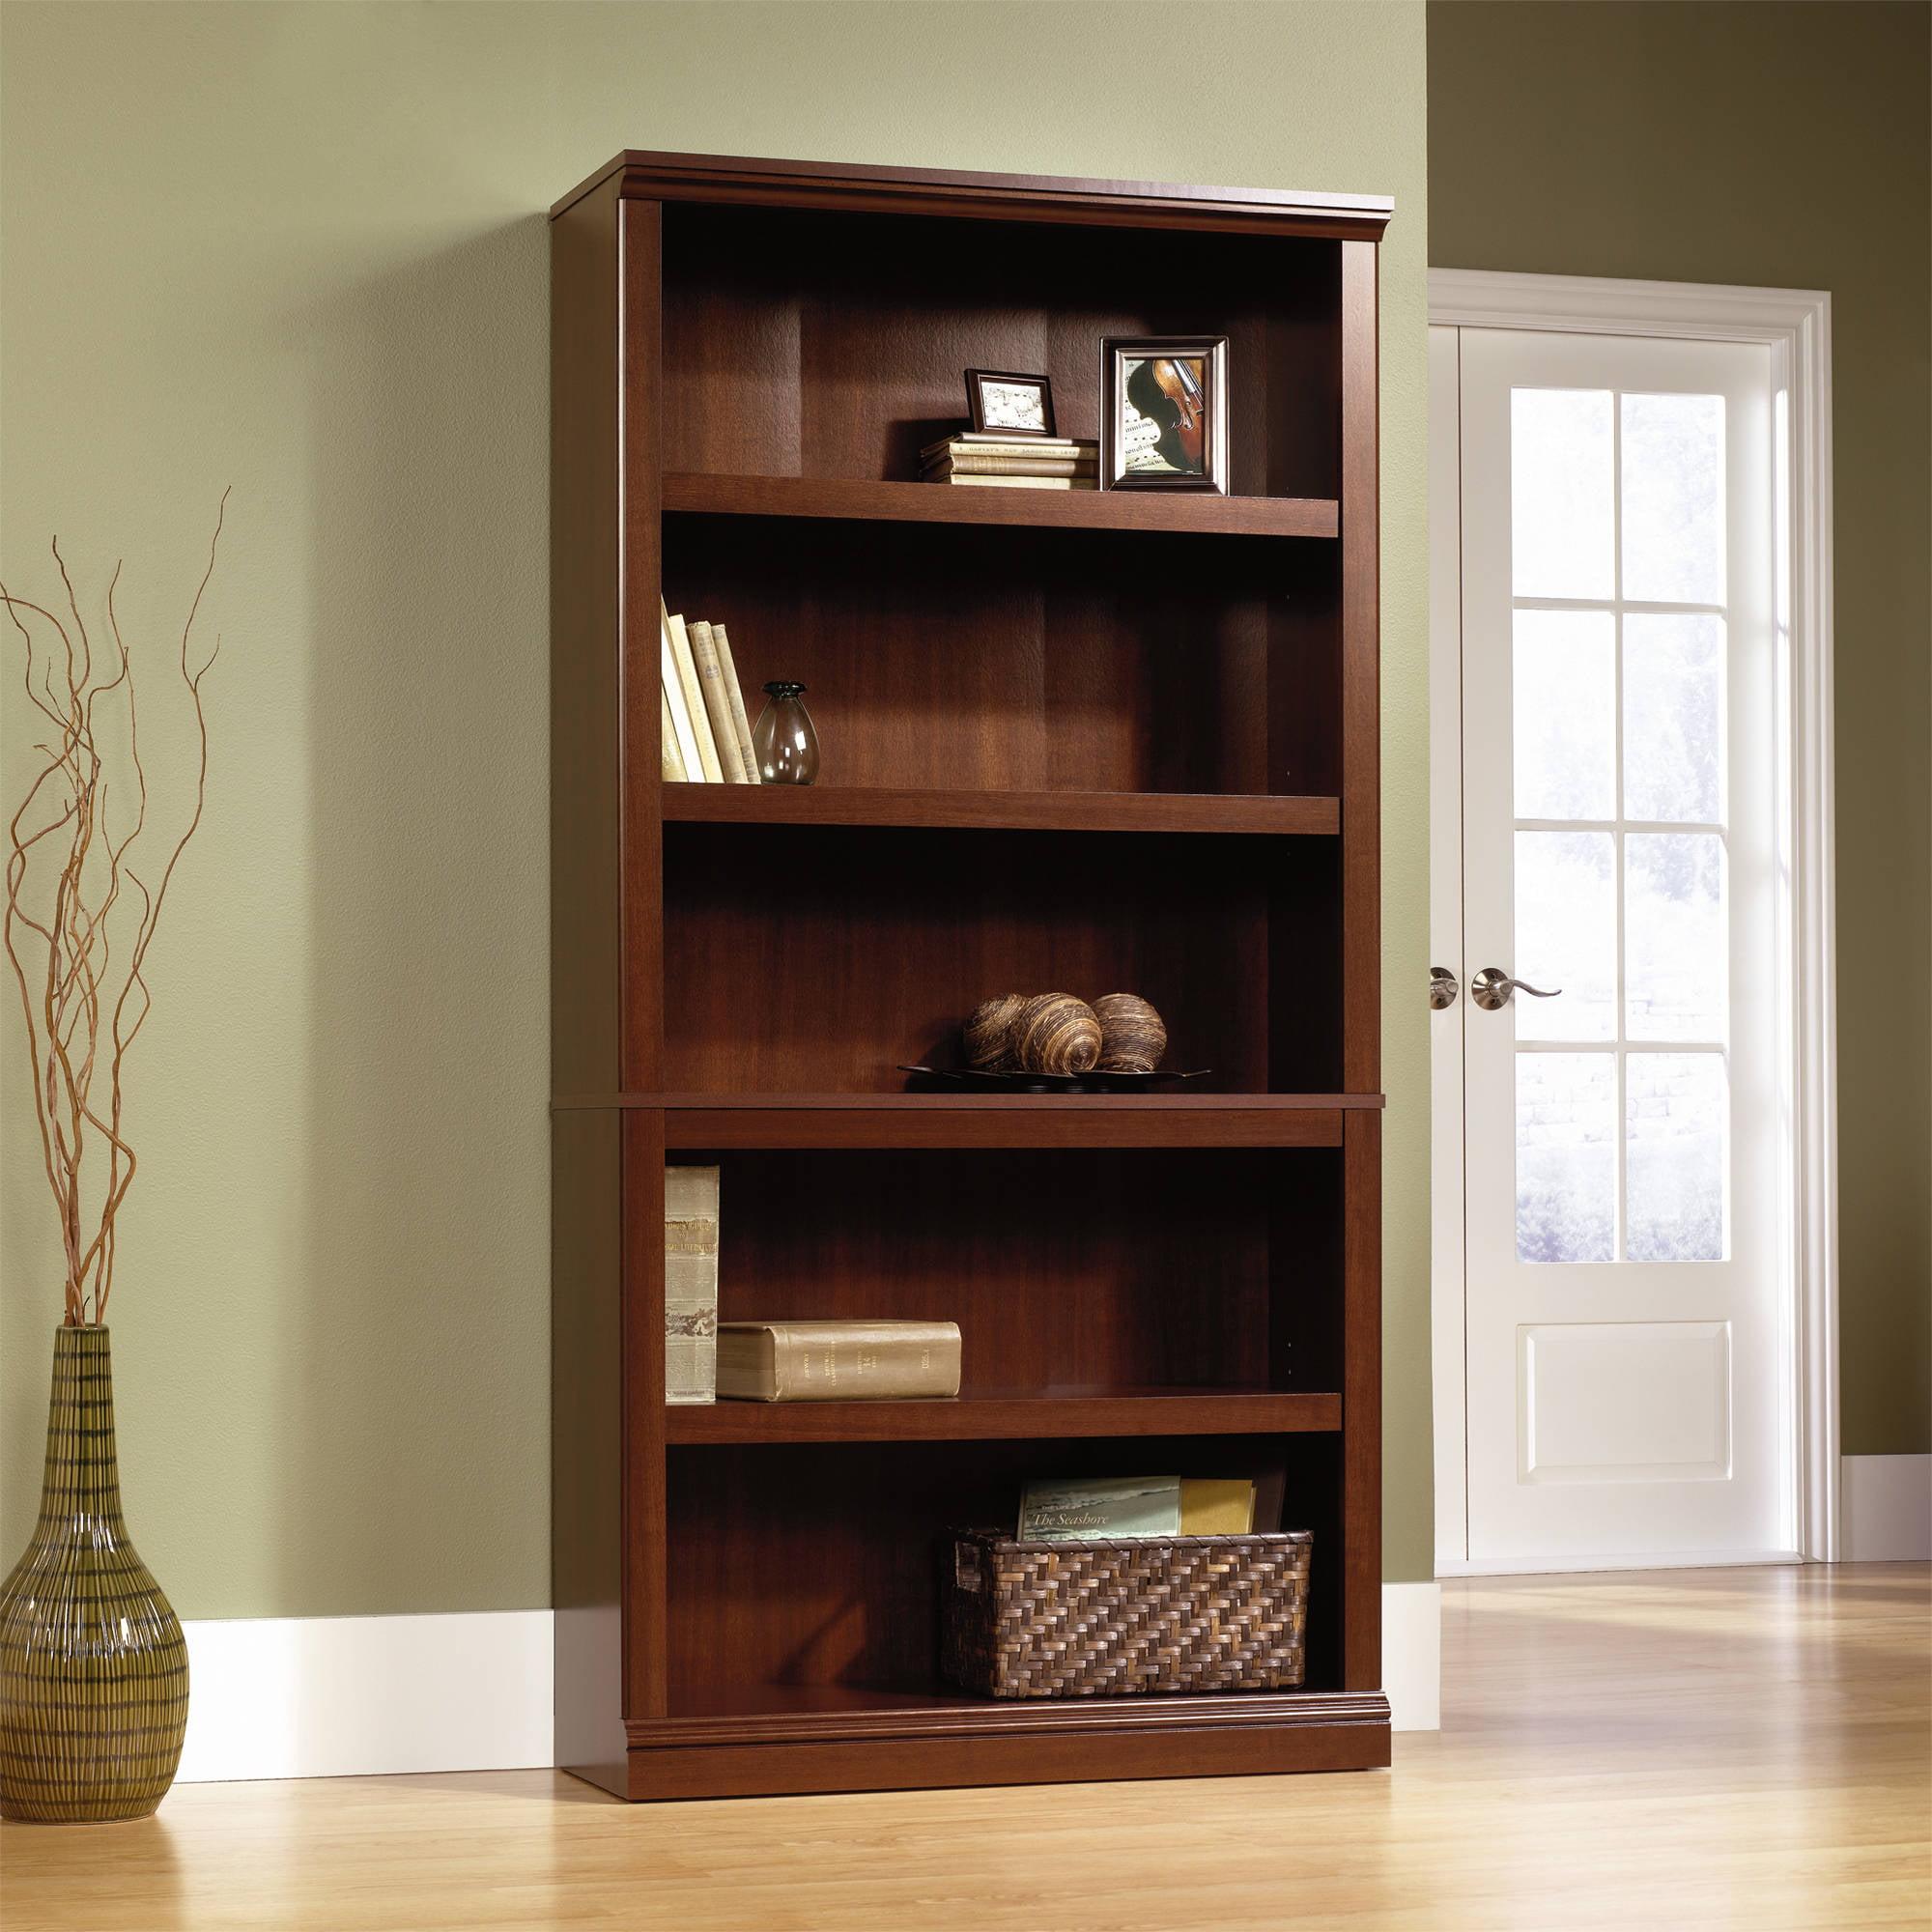 Sauder 5-Shelf Bookcase, Select Cherry Finish by Sauder Woodworking